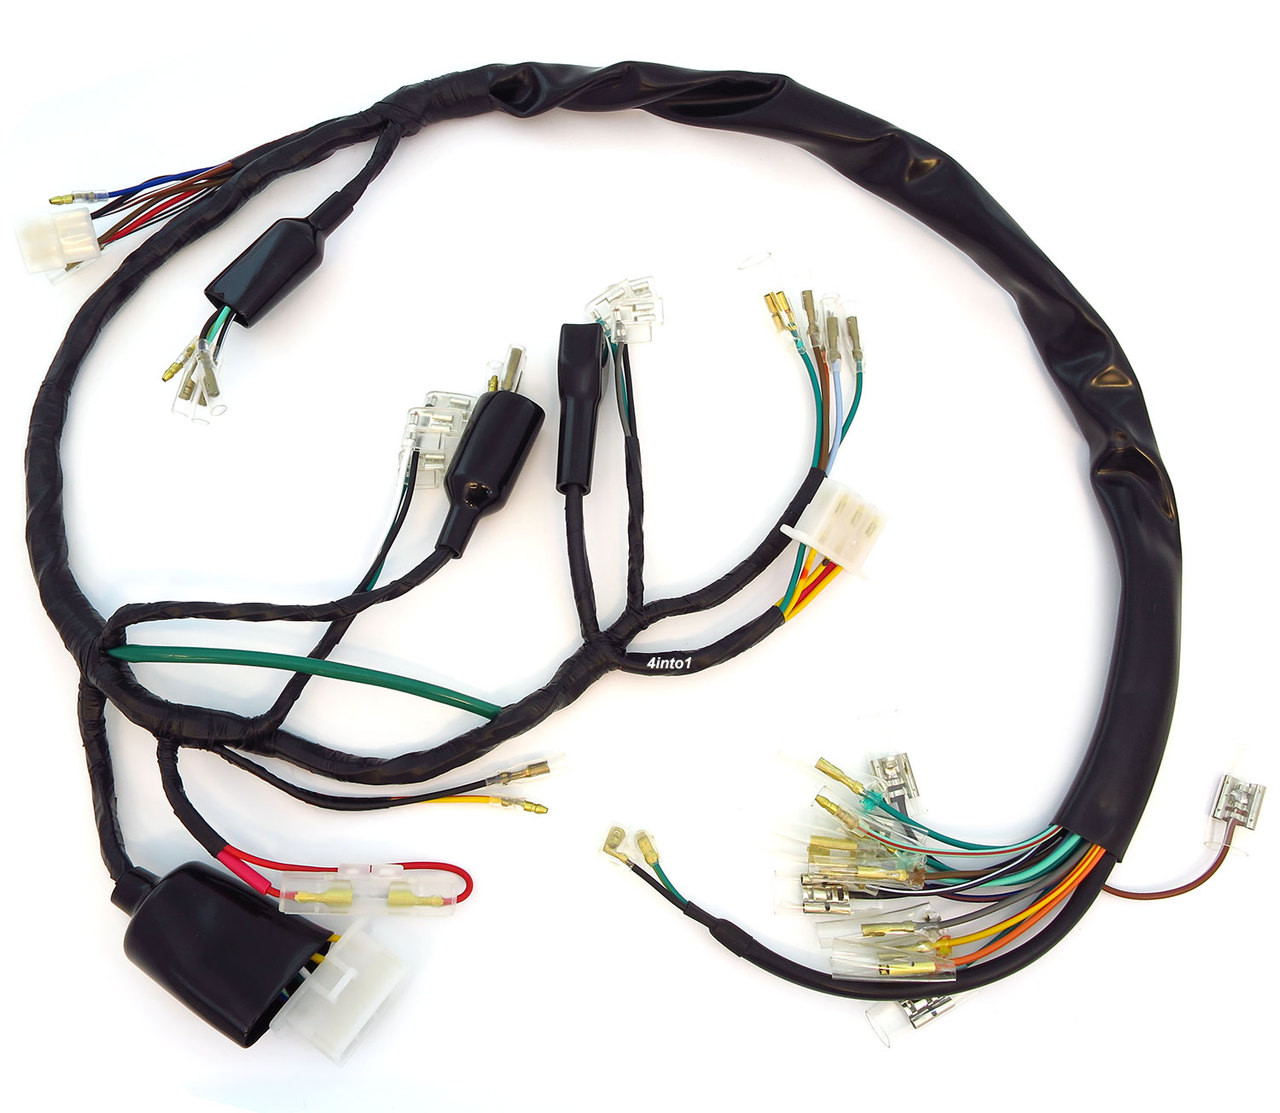 main wiring harness 32100 333 000 honda cb350f make your own honda cb350 wiring harness honda cb350 wiring harness [ 1280 x 1113 Pixel ]